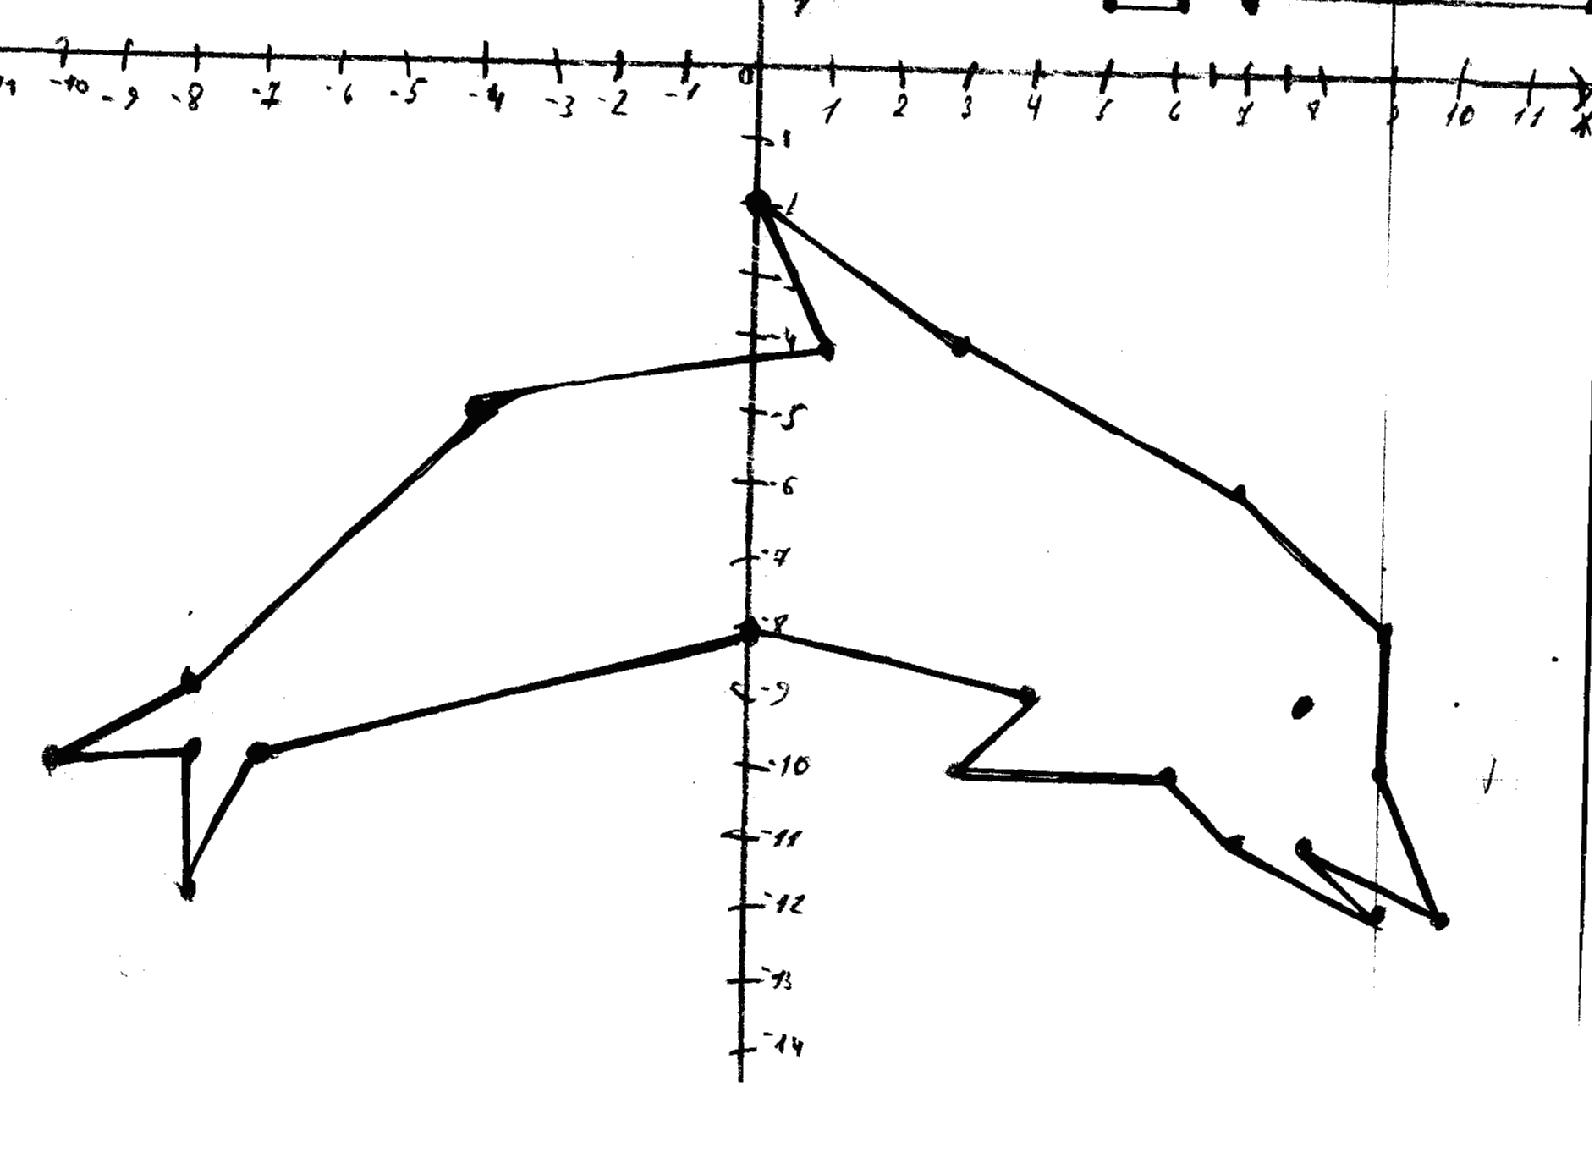 математический язык презентация 7 класс